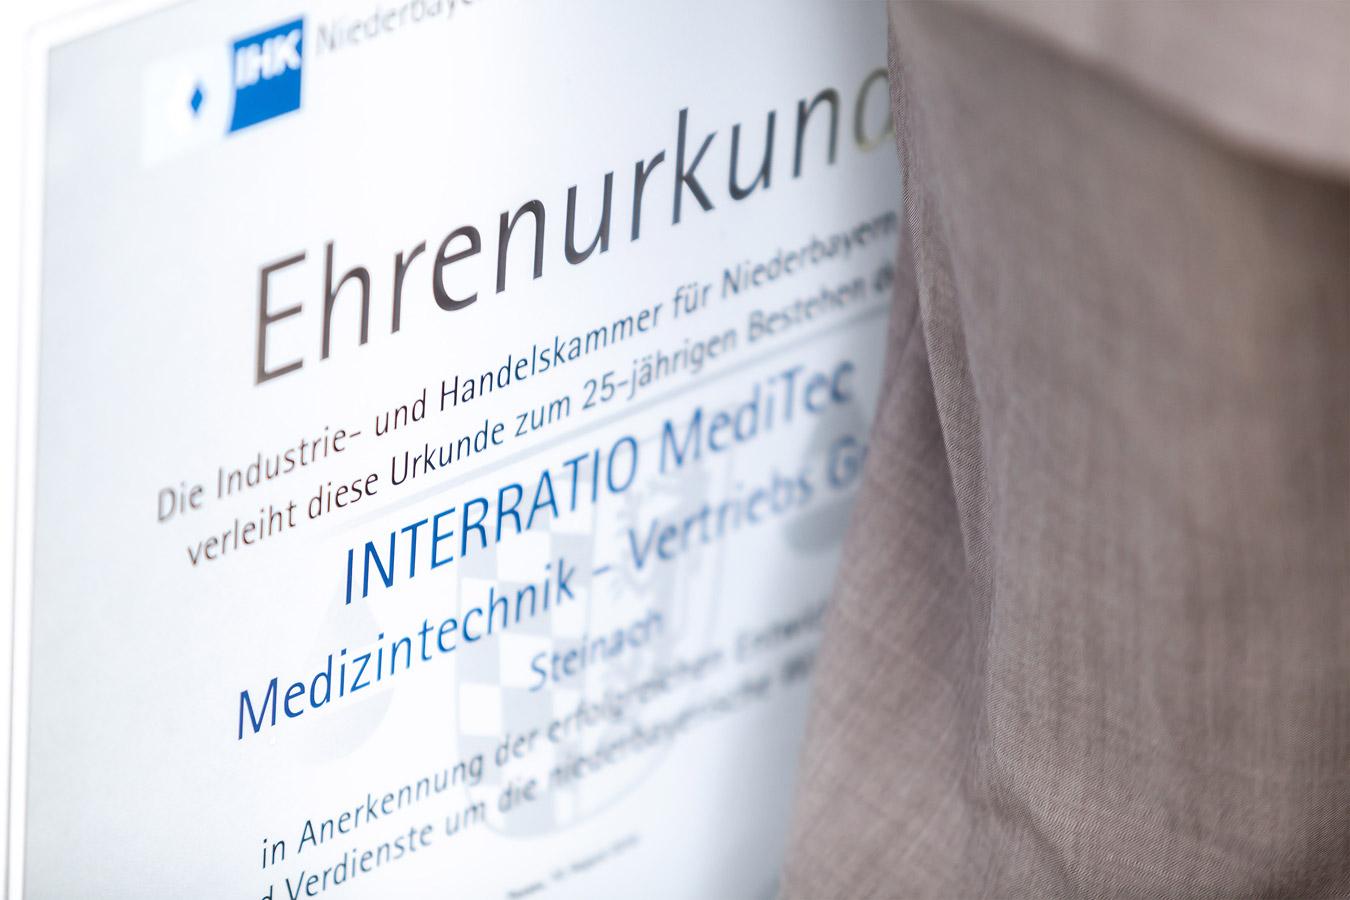 Interatio Meditec /Business/ Portrait / Event / Fotostyle Schindler / Fotograf